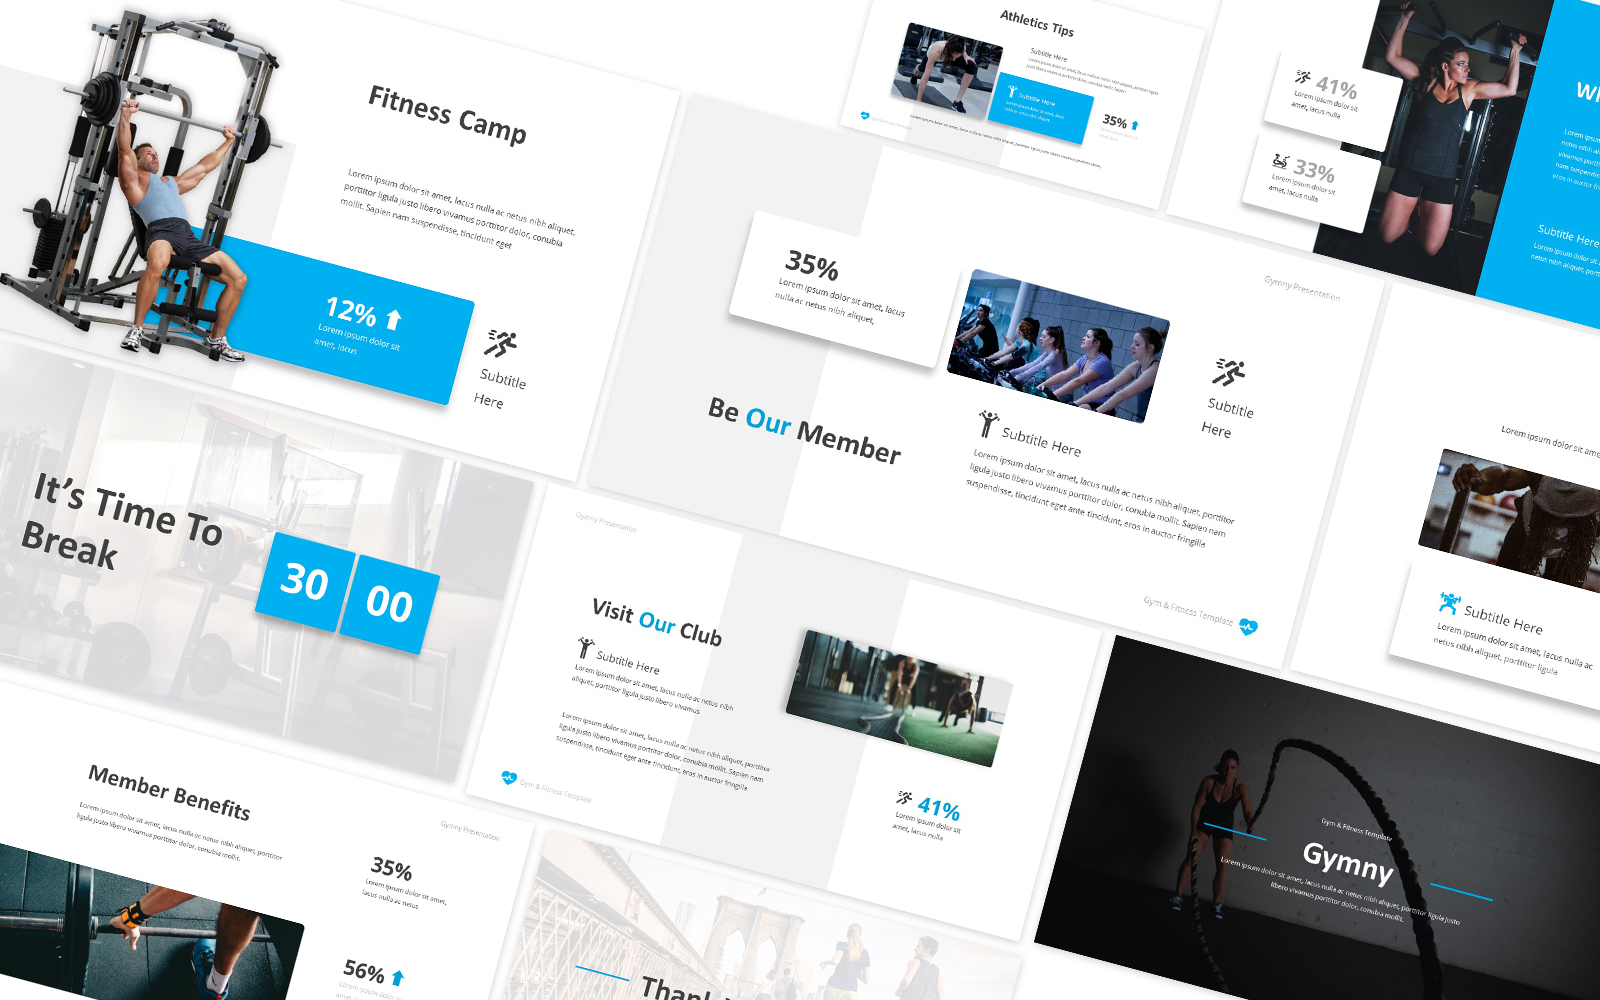 Gymny Gym & Fitness Powerpoint Template